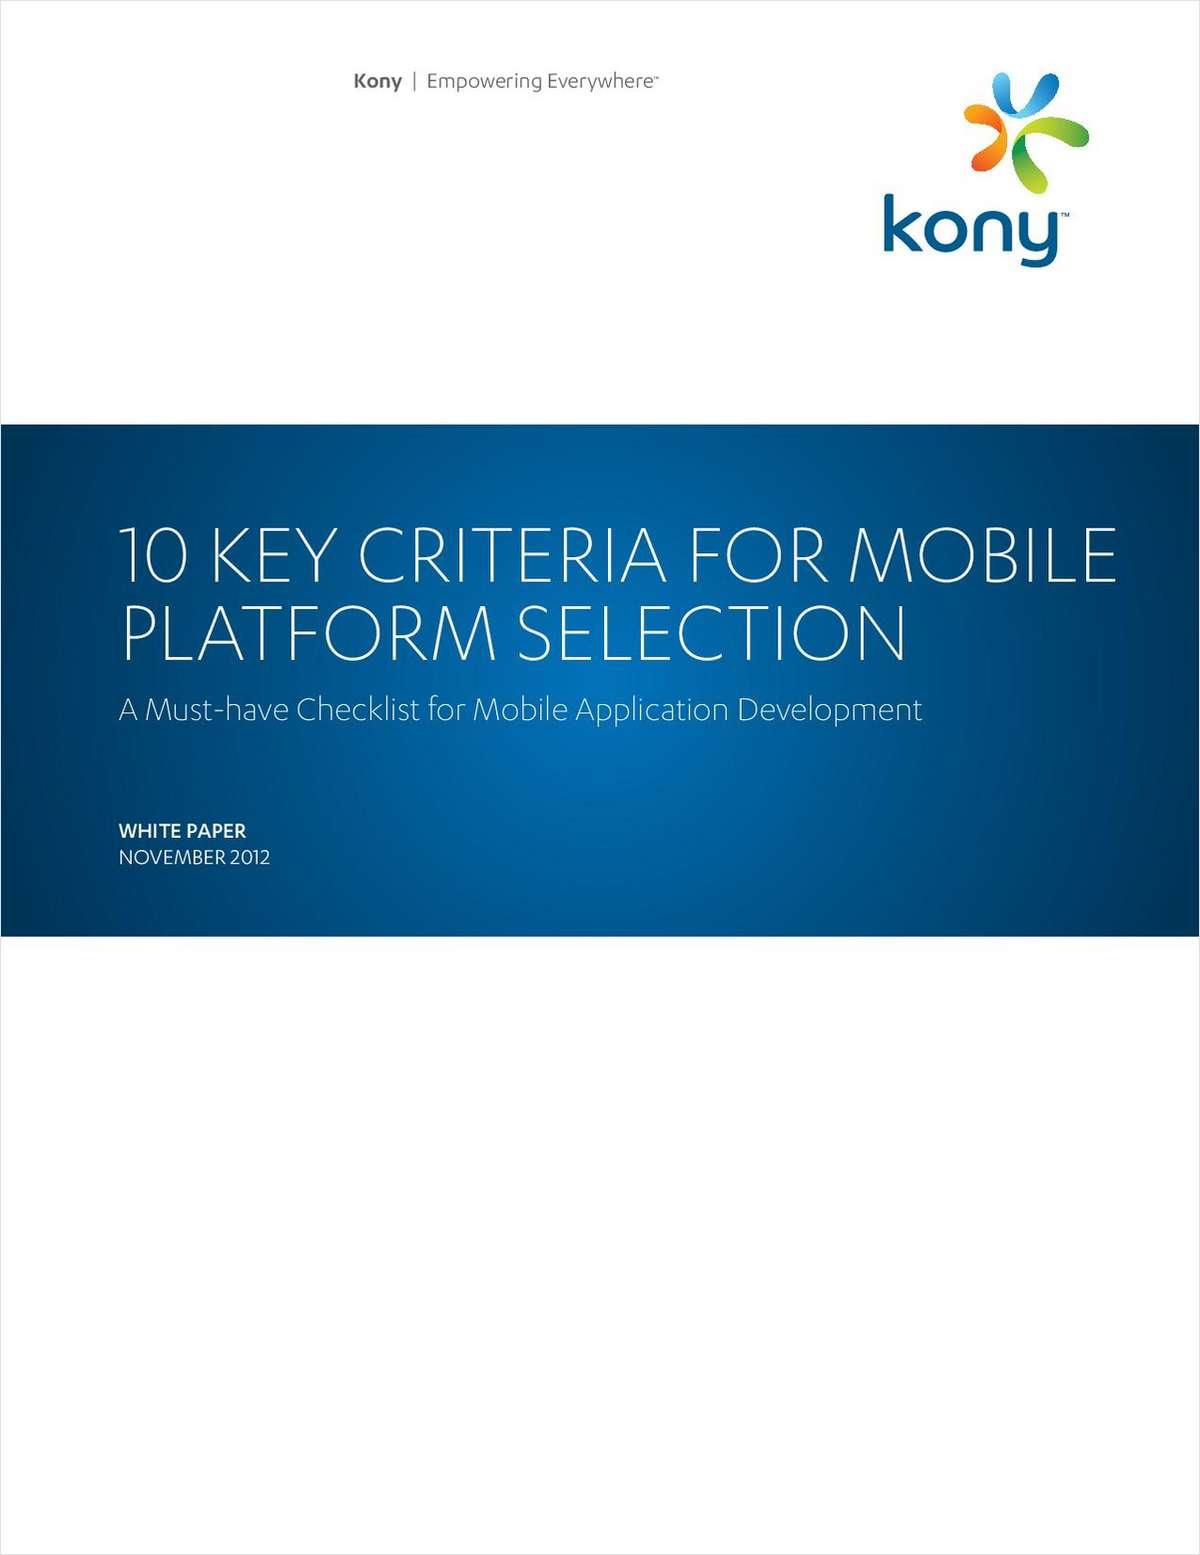 10 Key Criteria for Mobile Platform Selection